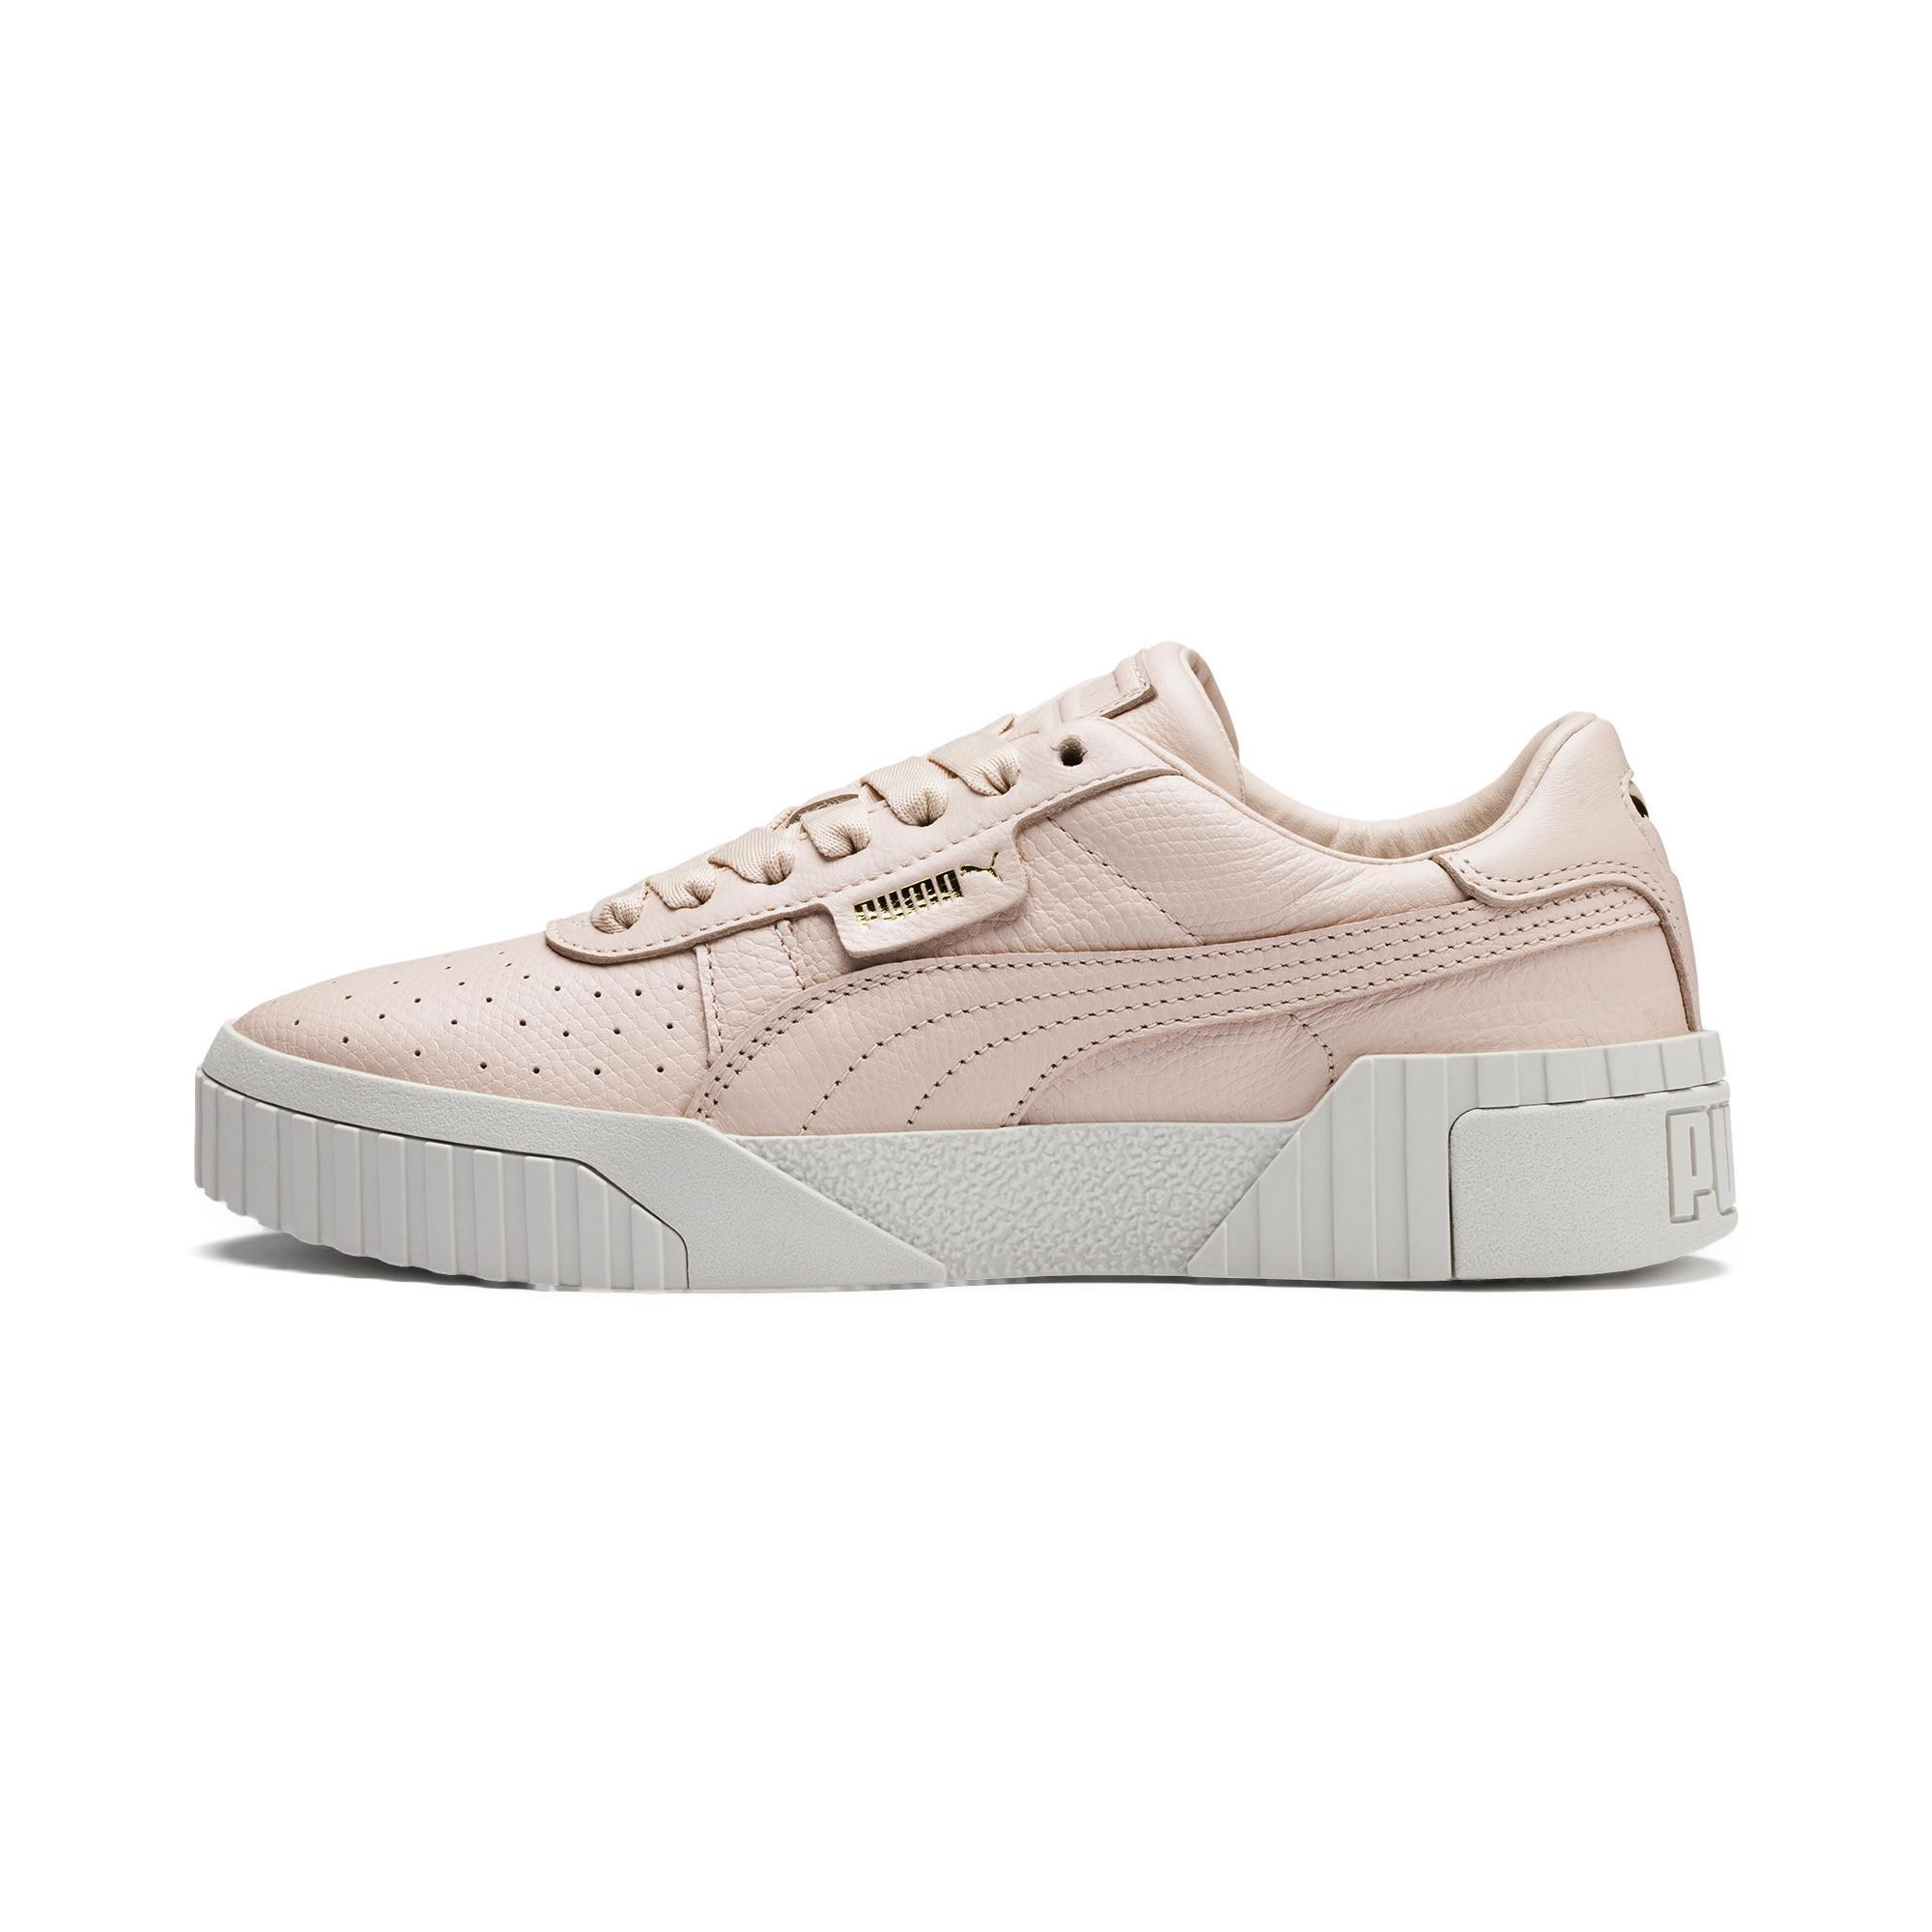 Lyst - PUMA Cali Emboss Women s Sneakers b90ba681e